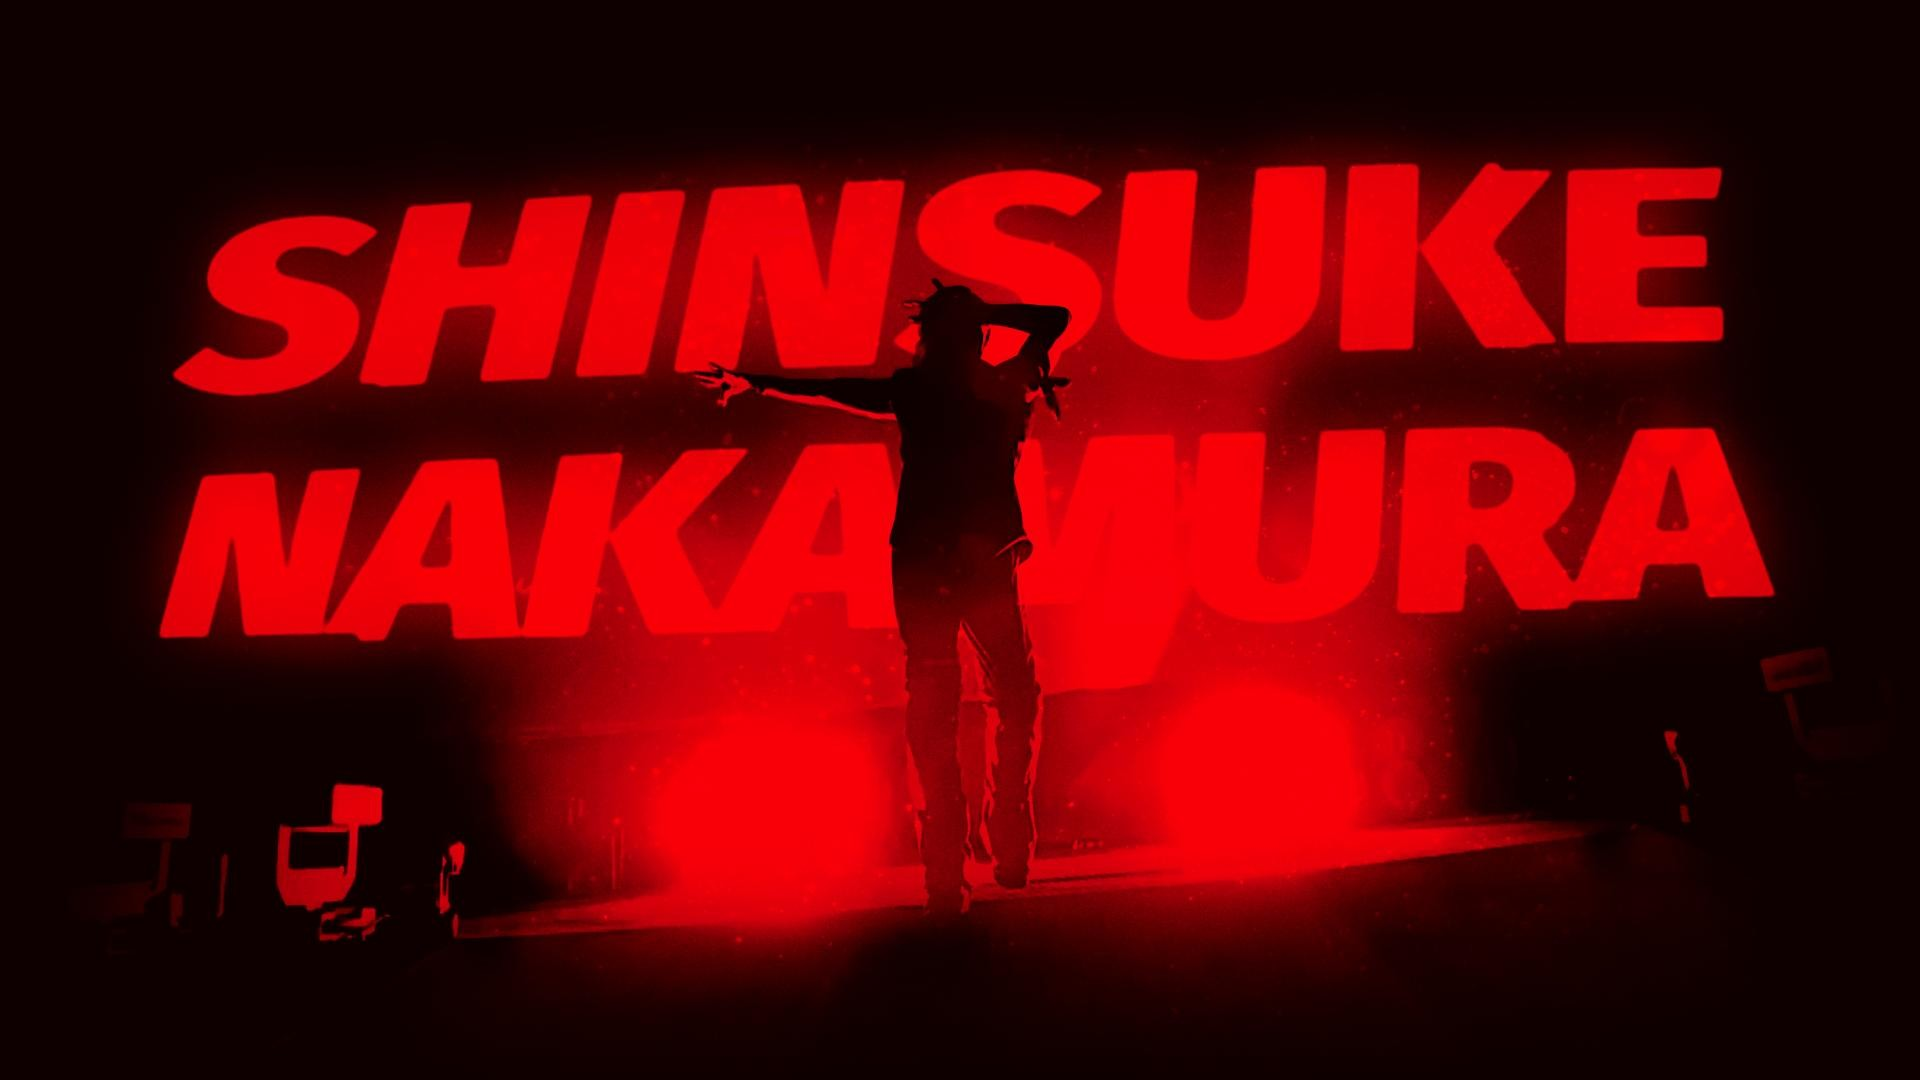 [NXT TAKEOVER SPOILERS] Nakamura Entrance Wallpaper.